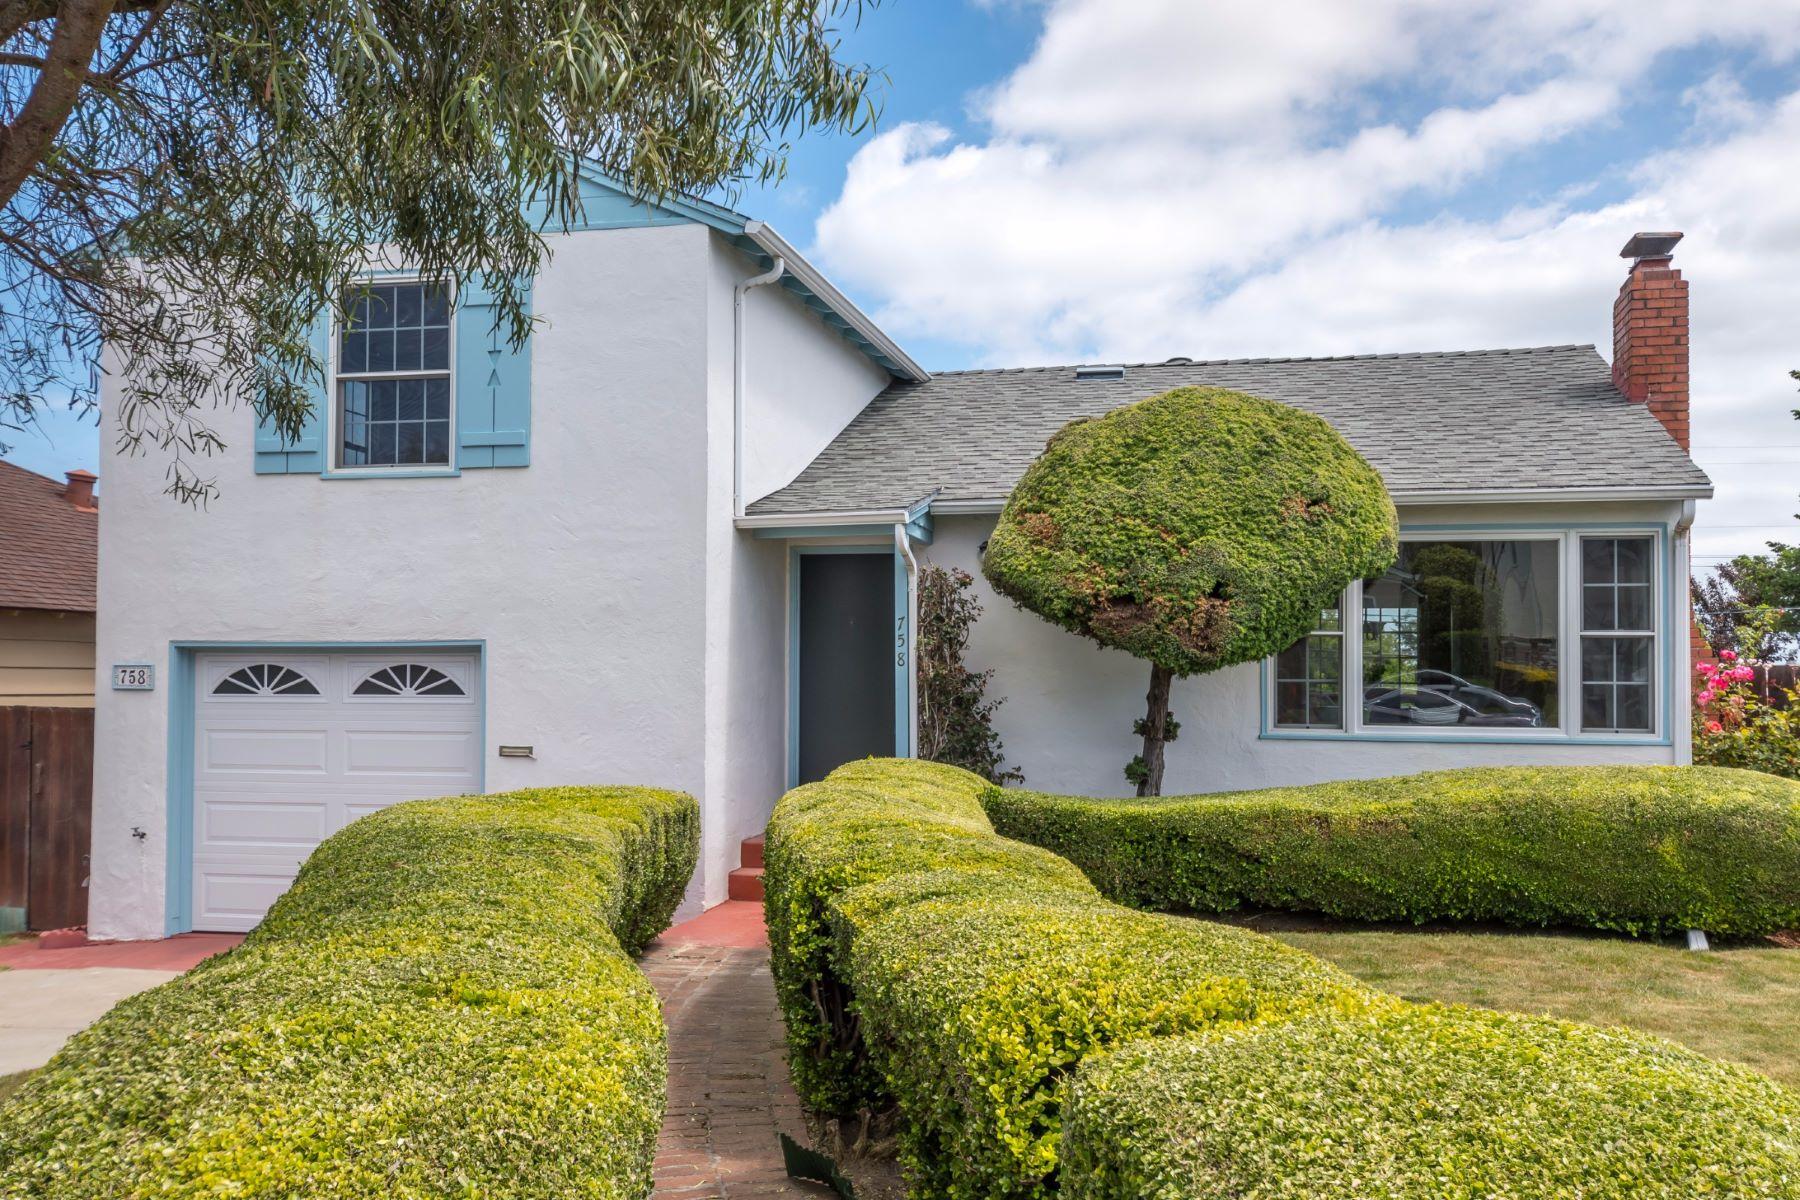 Single Family Home for Sale at 758 Magnolia Avenue San Bruno, California 94066 United States